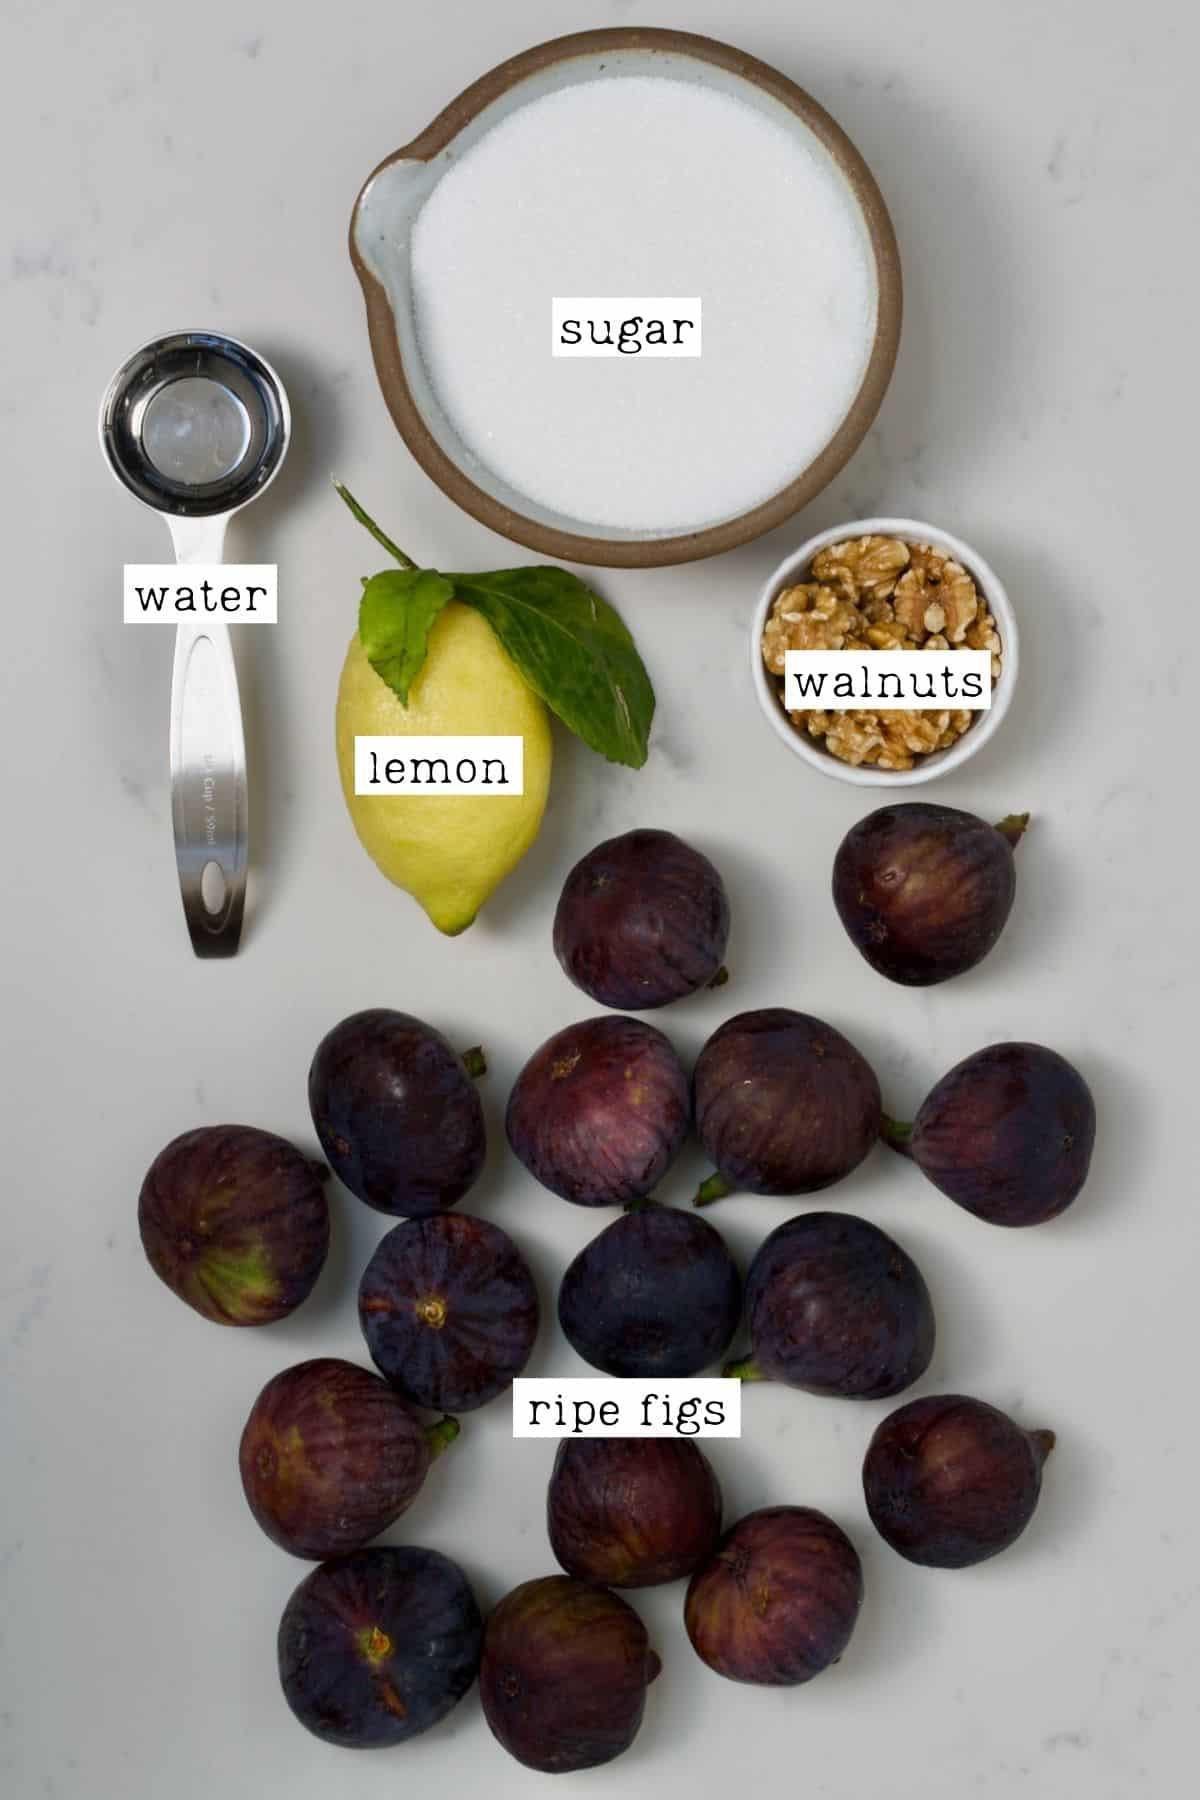 Ingredients for fig jam